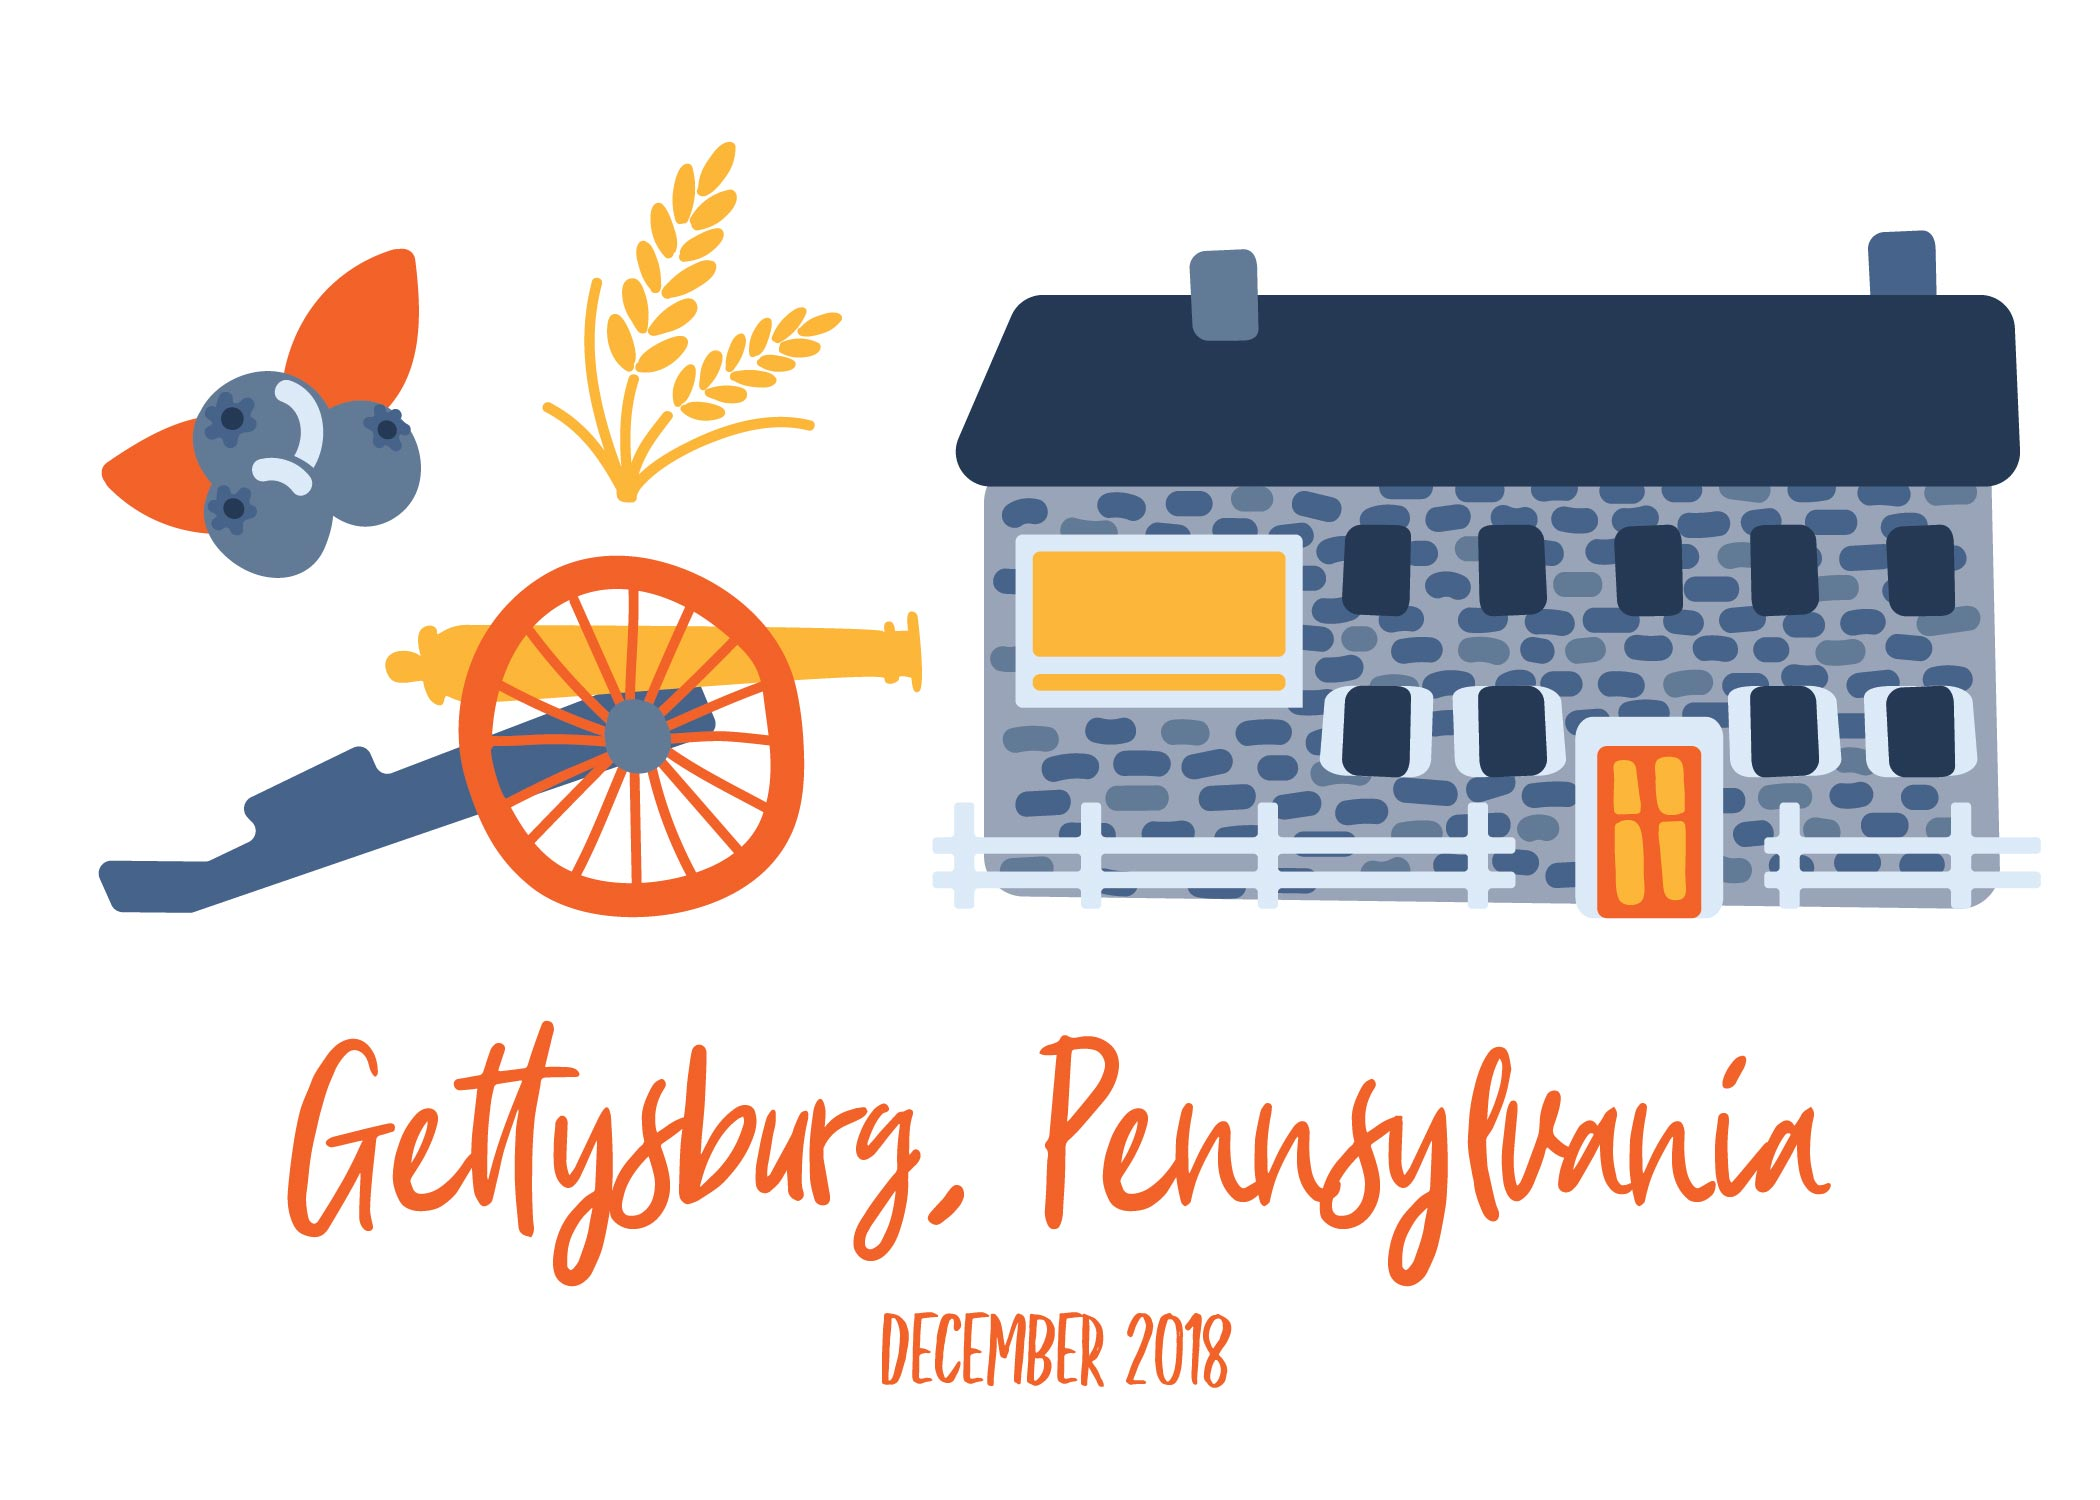 gettysburg-01